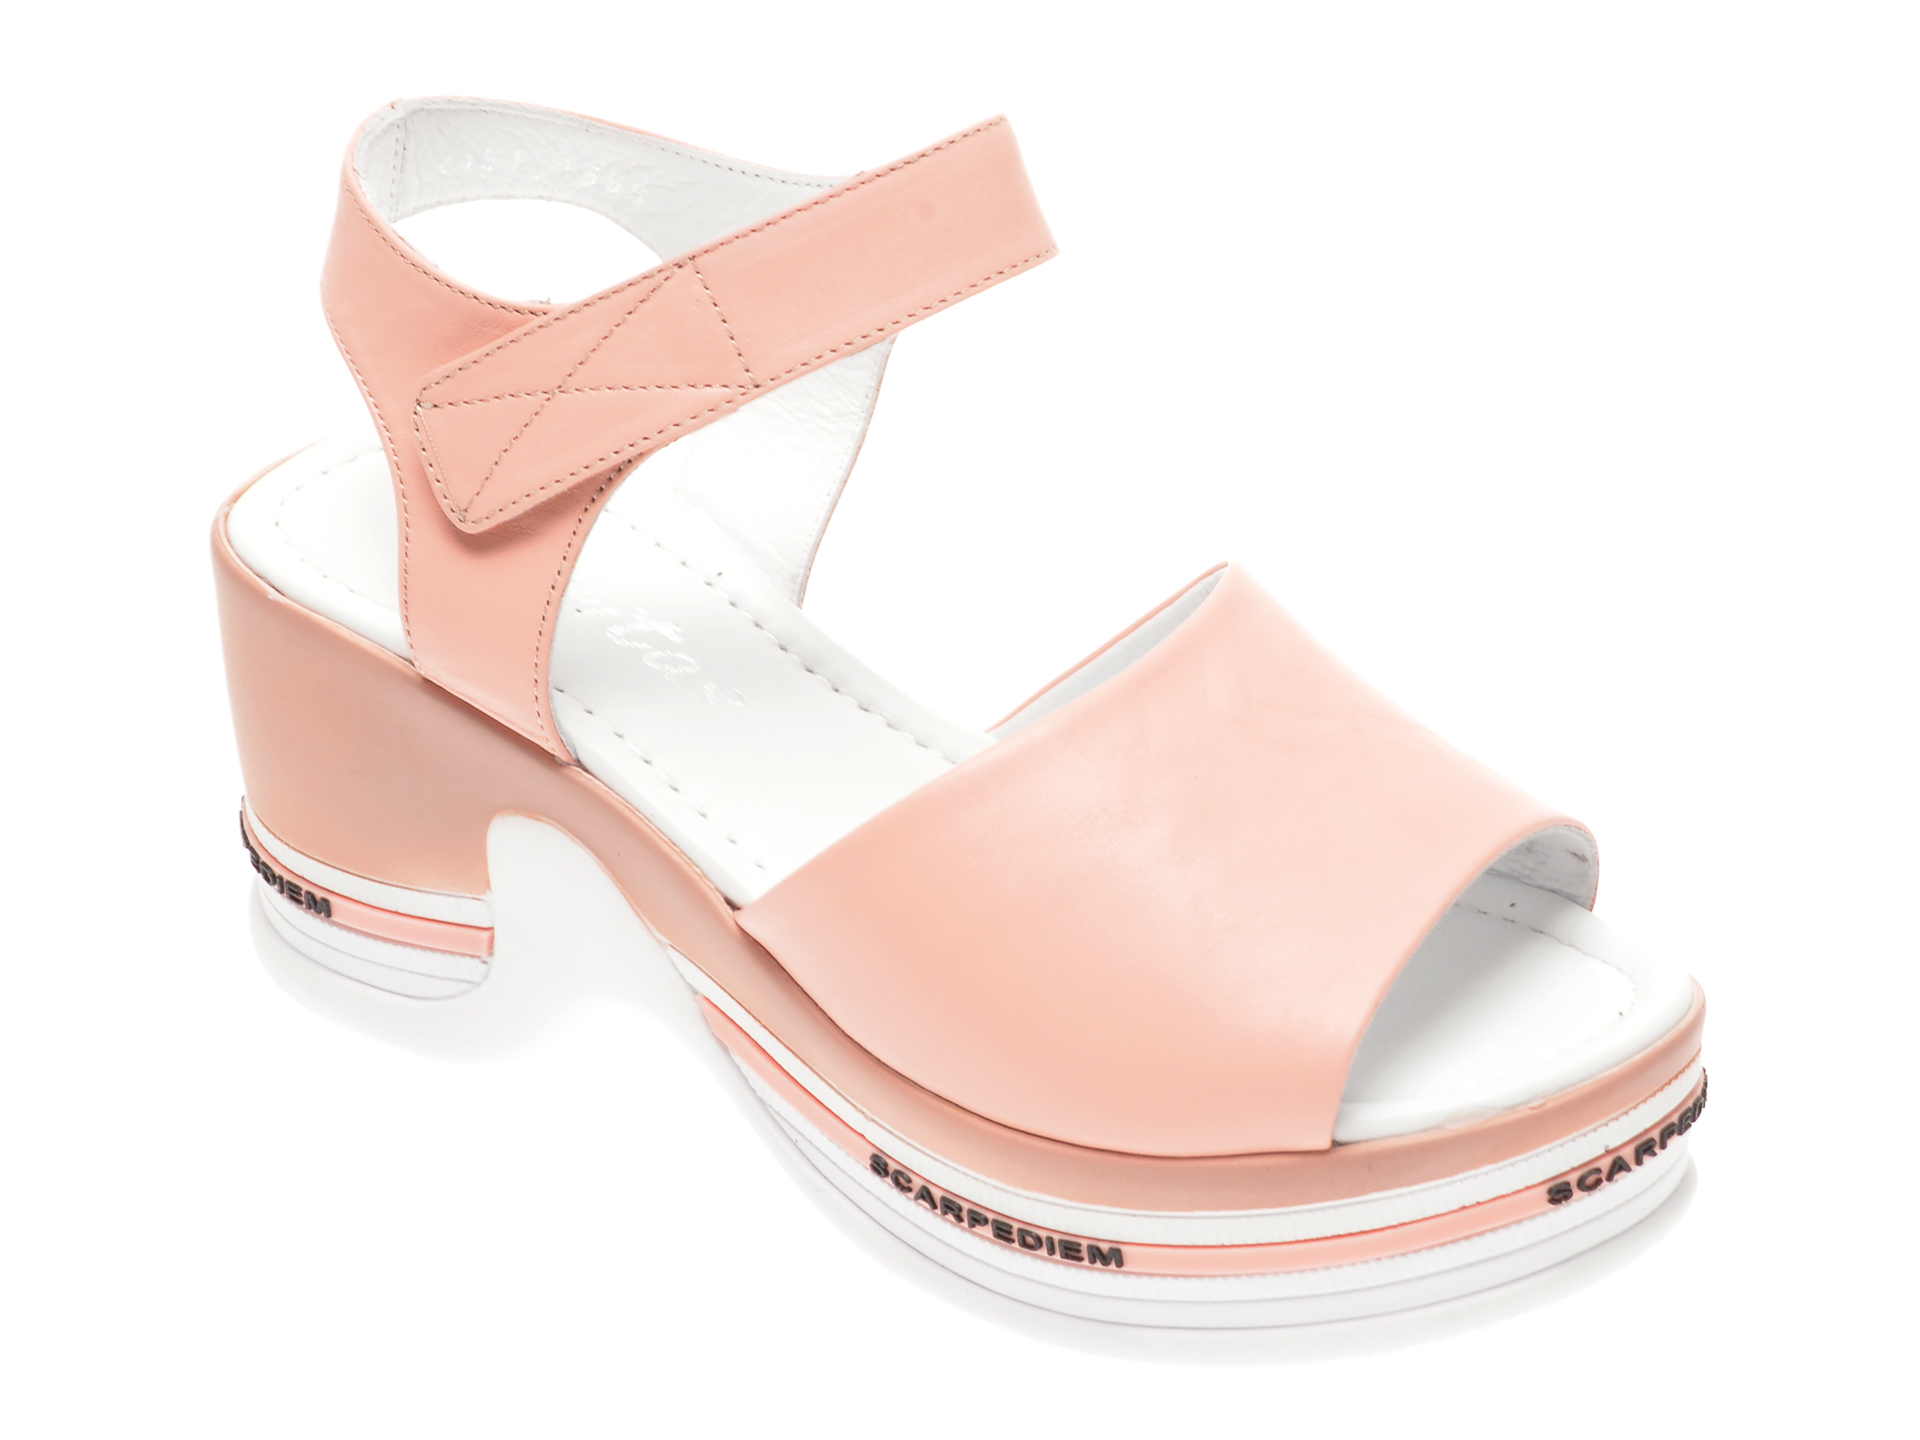 Sandale MISS LIZA roz, 1182451, din piele naturala